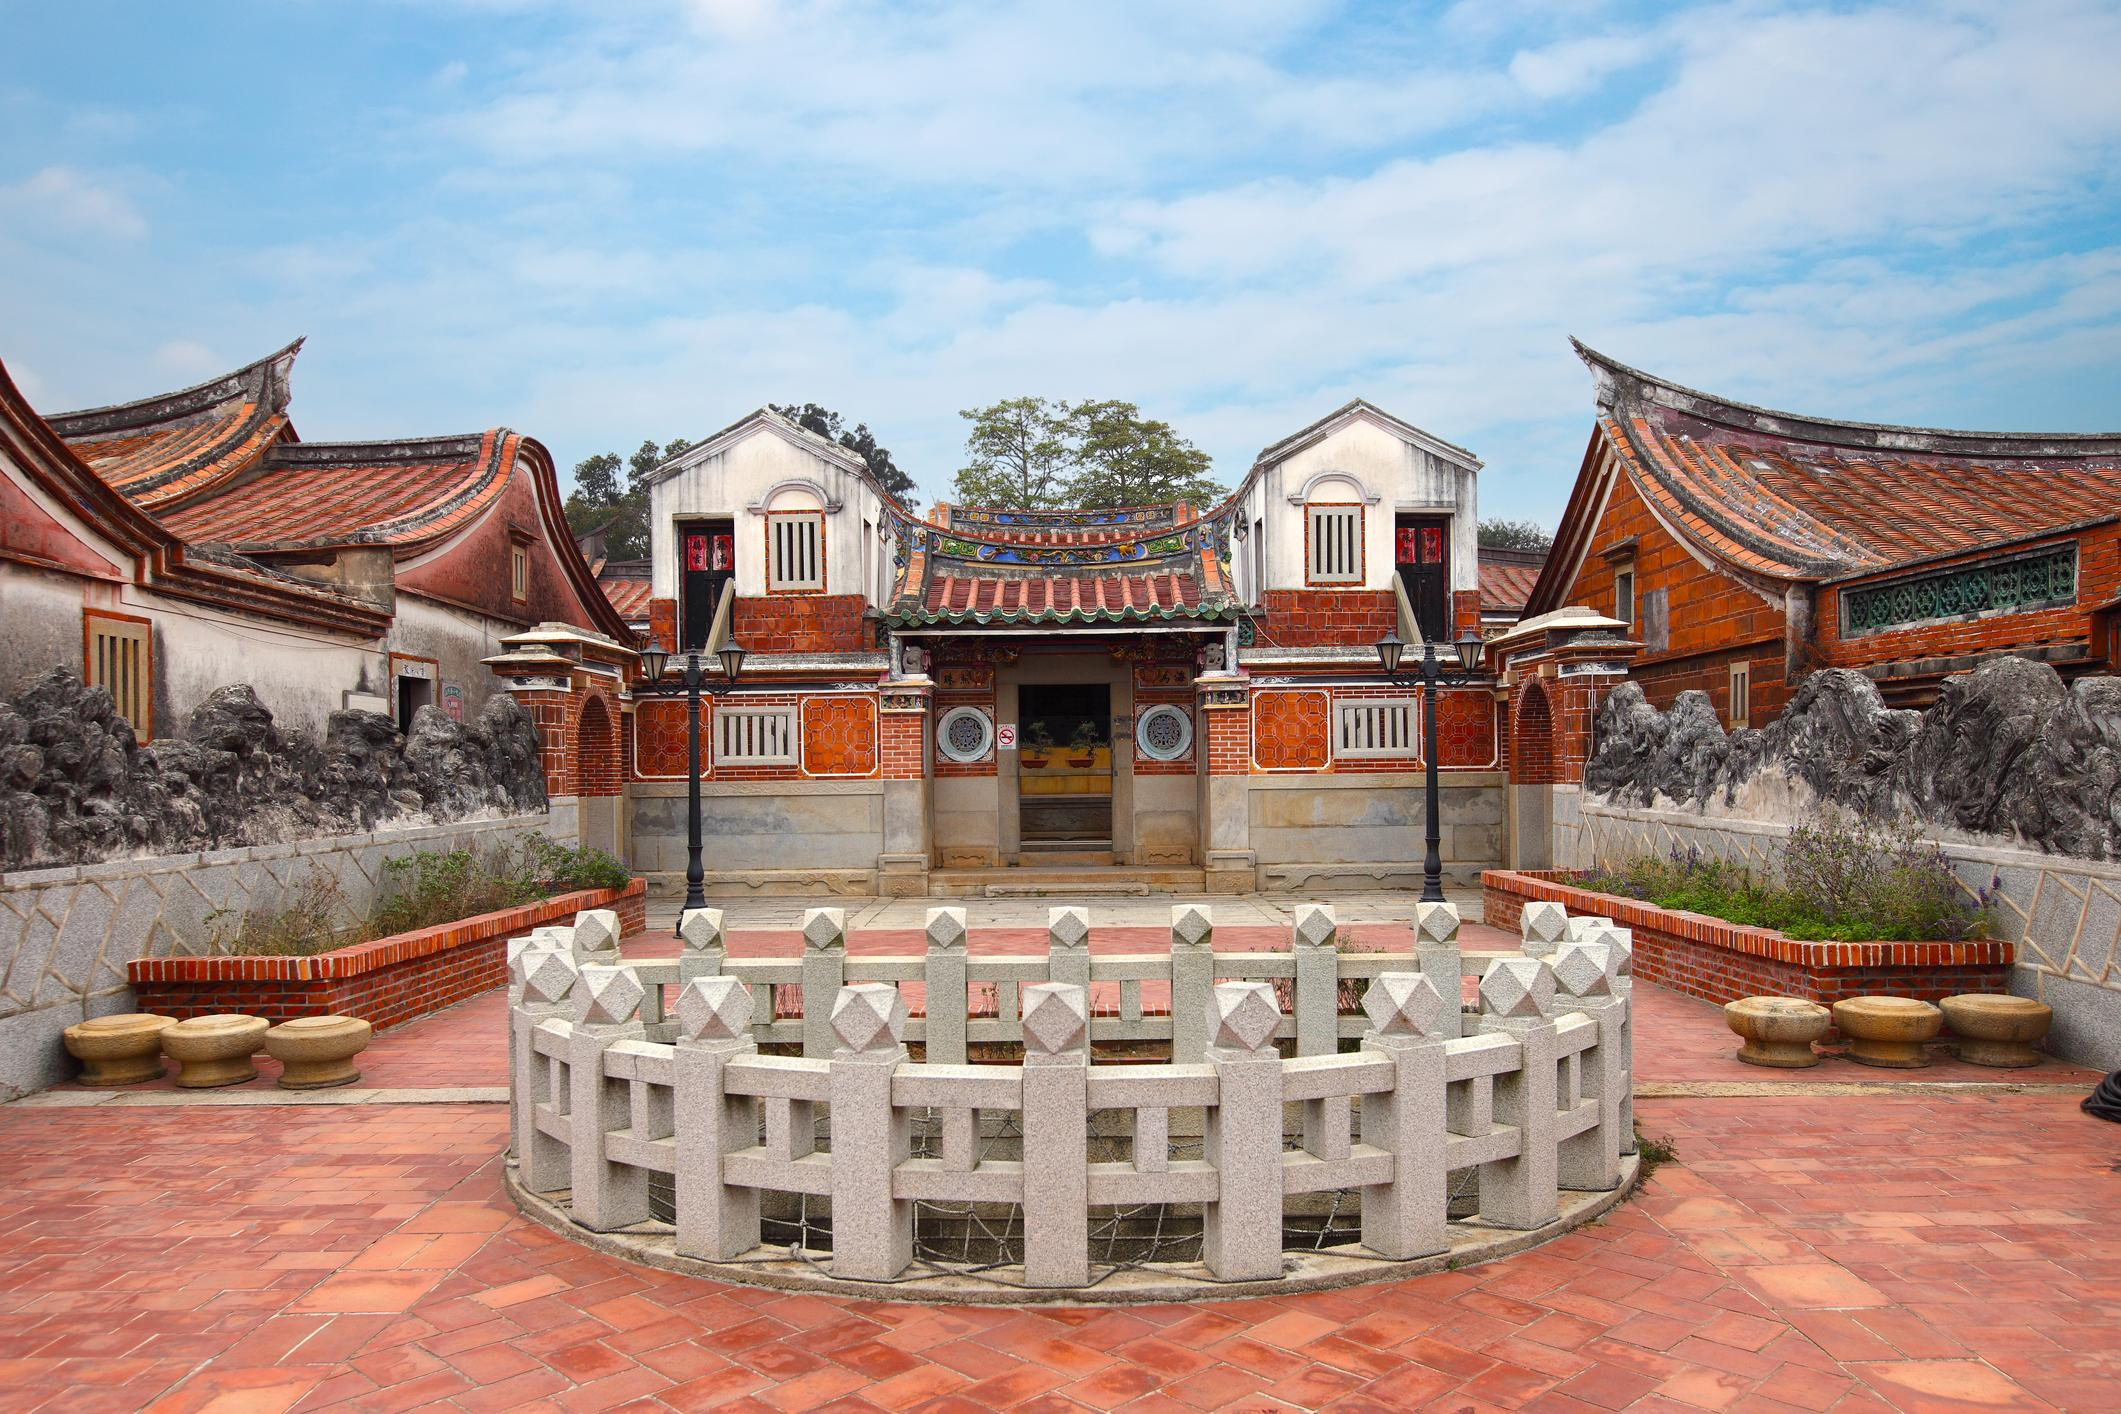 Kinmen traditional architecture-Sean3810-iStock-525326509.jpg